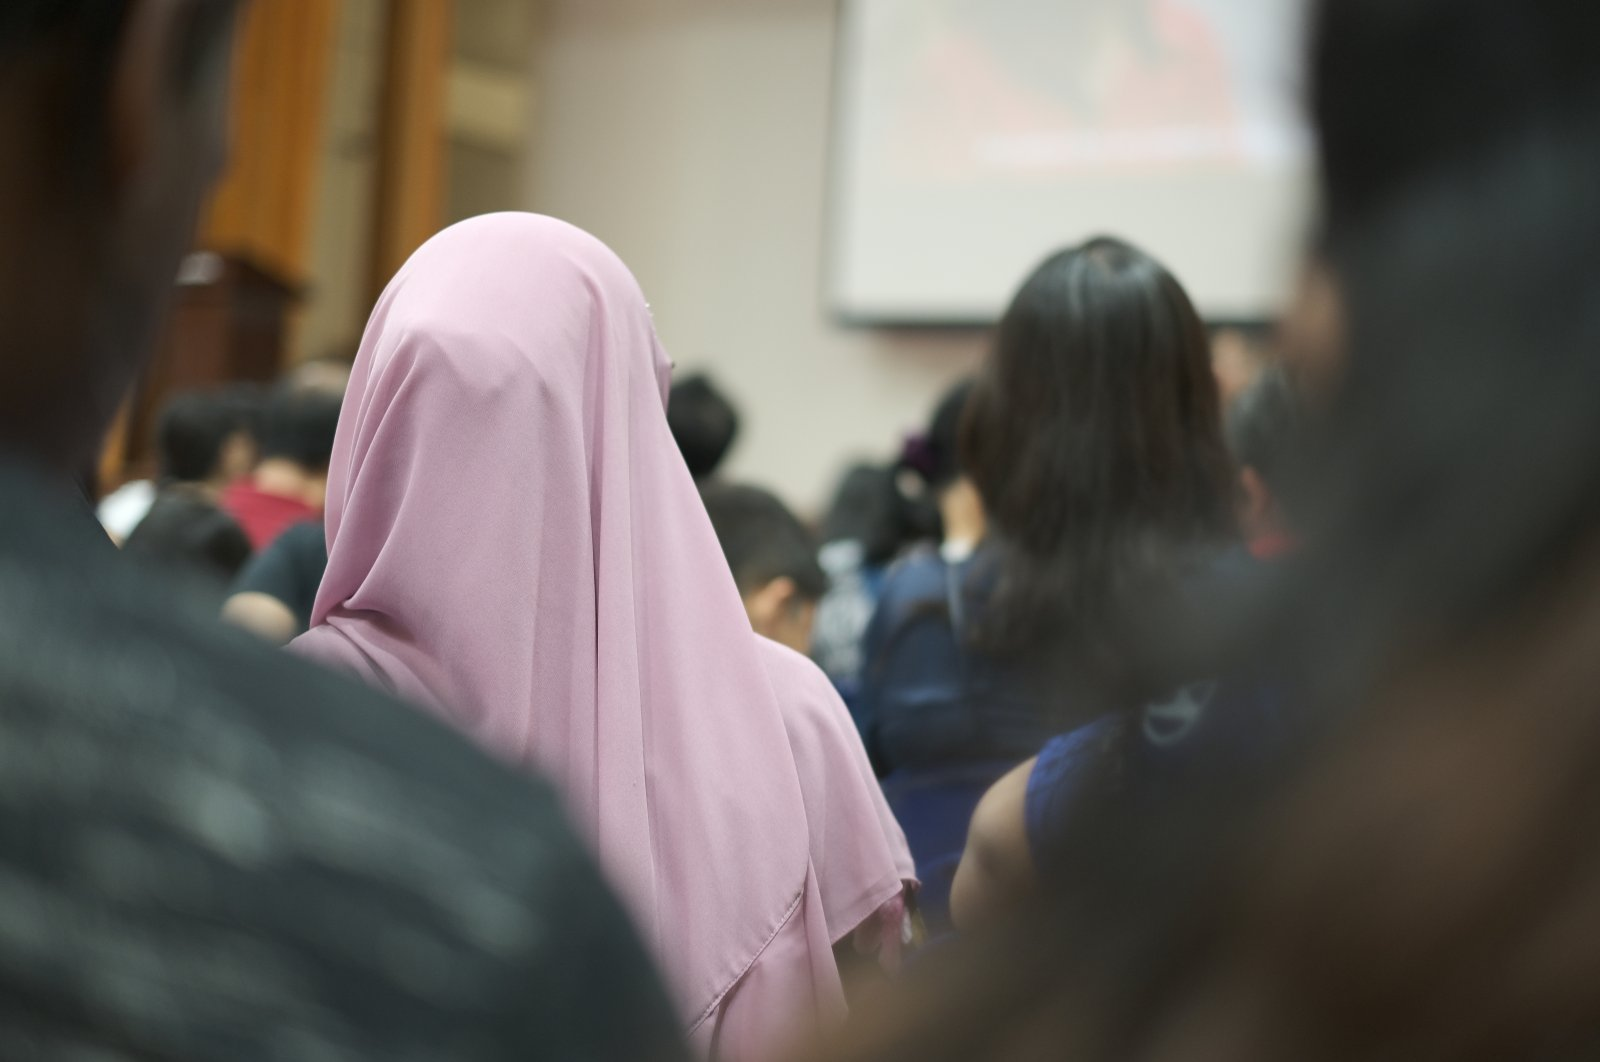 Women wearing a purple headscarf during a gathering of people. (Shutterstock Photo)